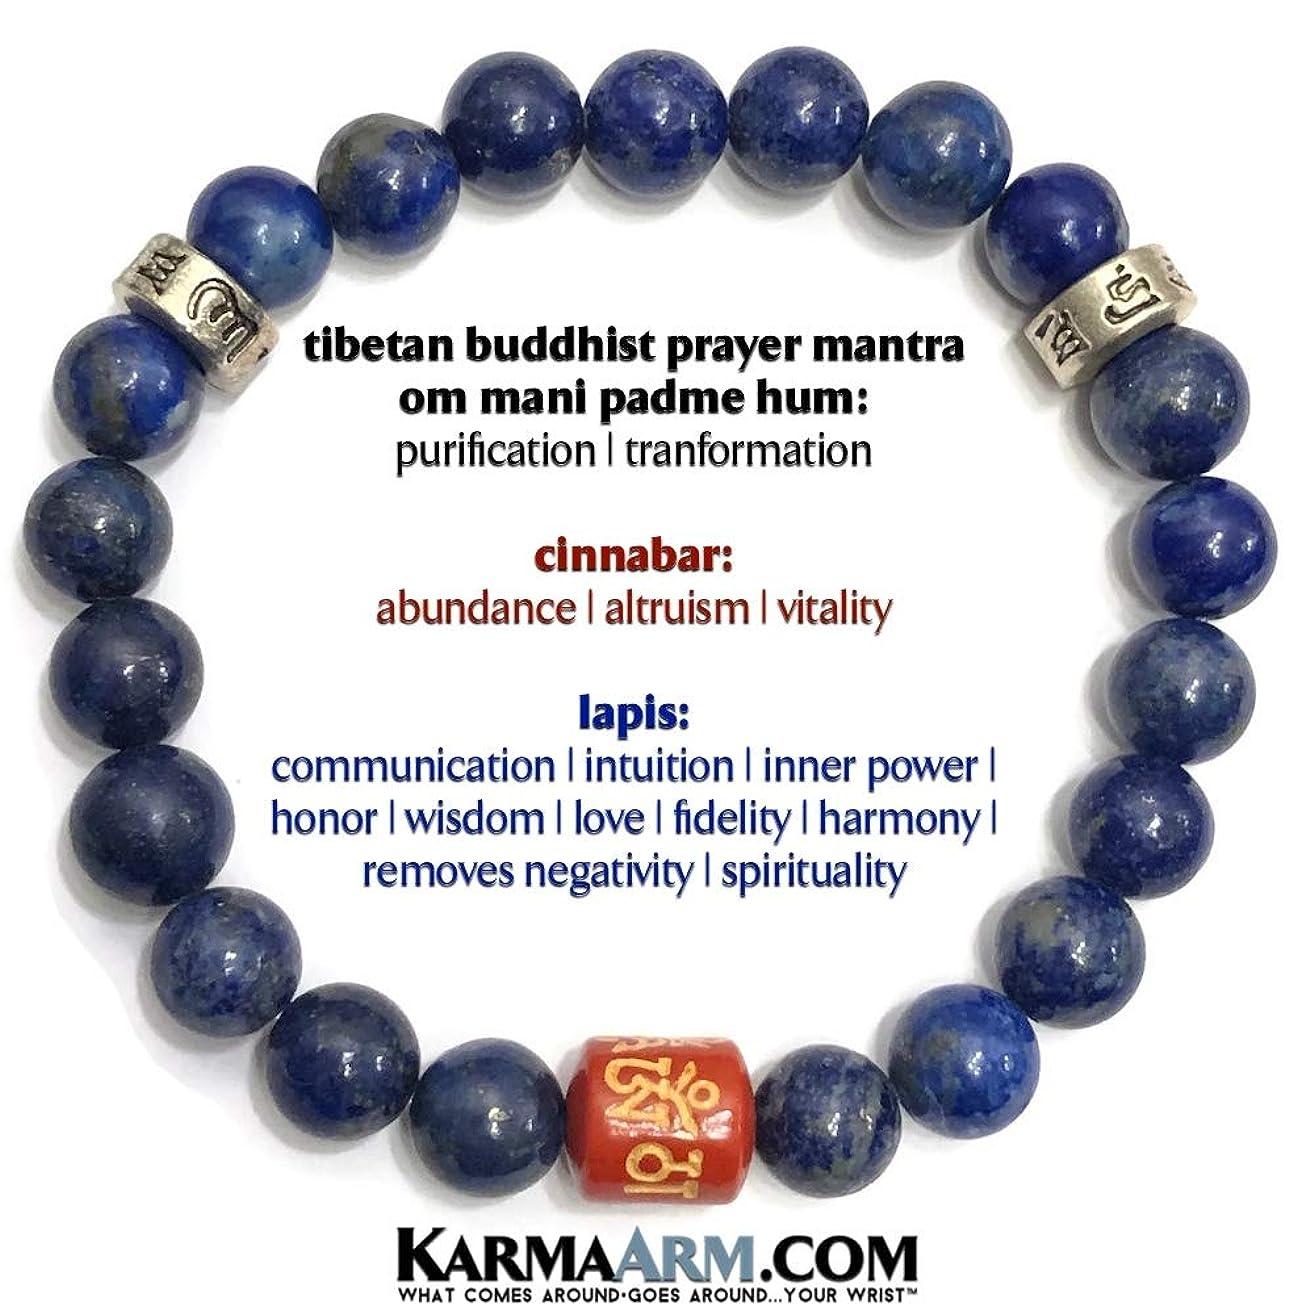 Om Mani Padme Hum Mantra Prayer Wheel: Cinnabar   Lapis Beaded Bracelets   Yoga Reiki Healing Chakra BoHo Spiritual Meditation Jewelry